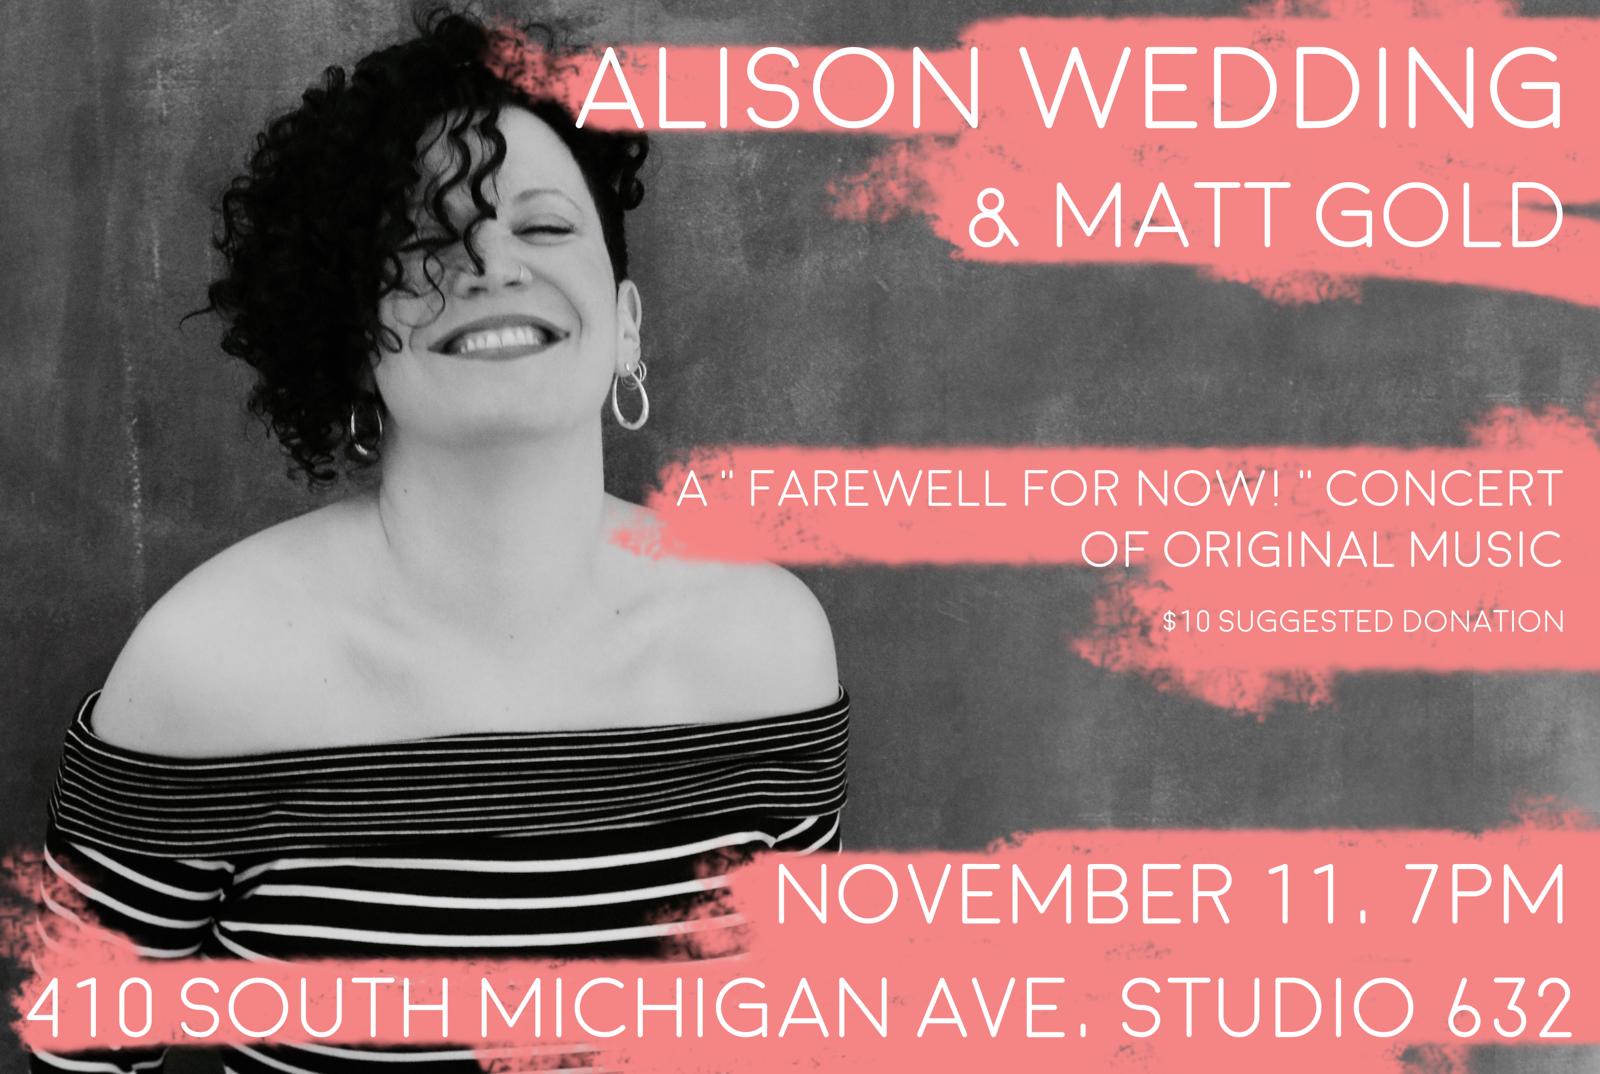 Alison_Wedding_Concert.png